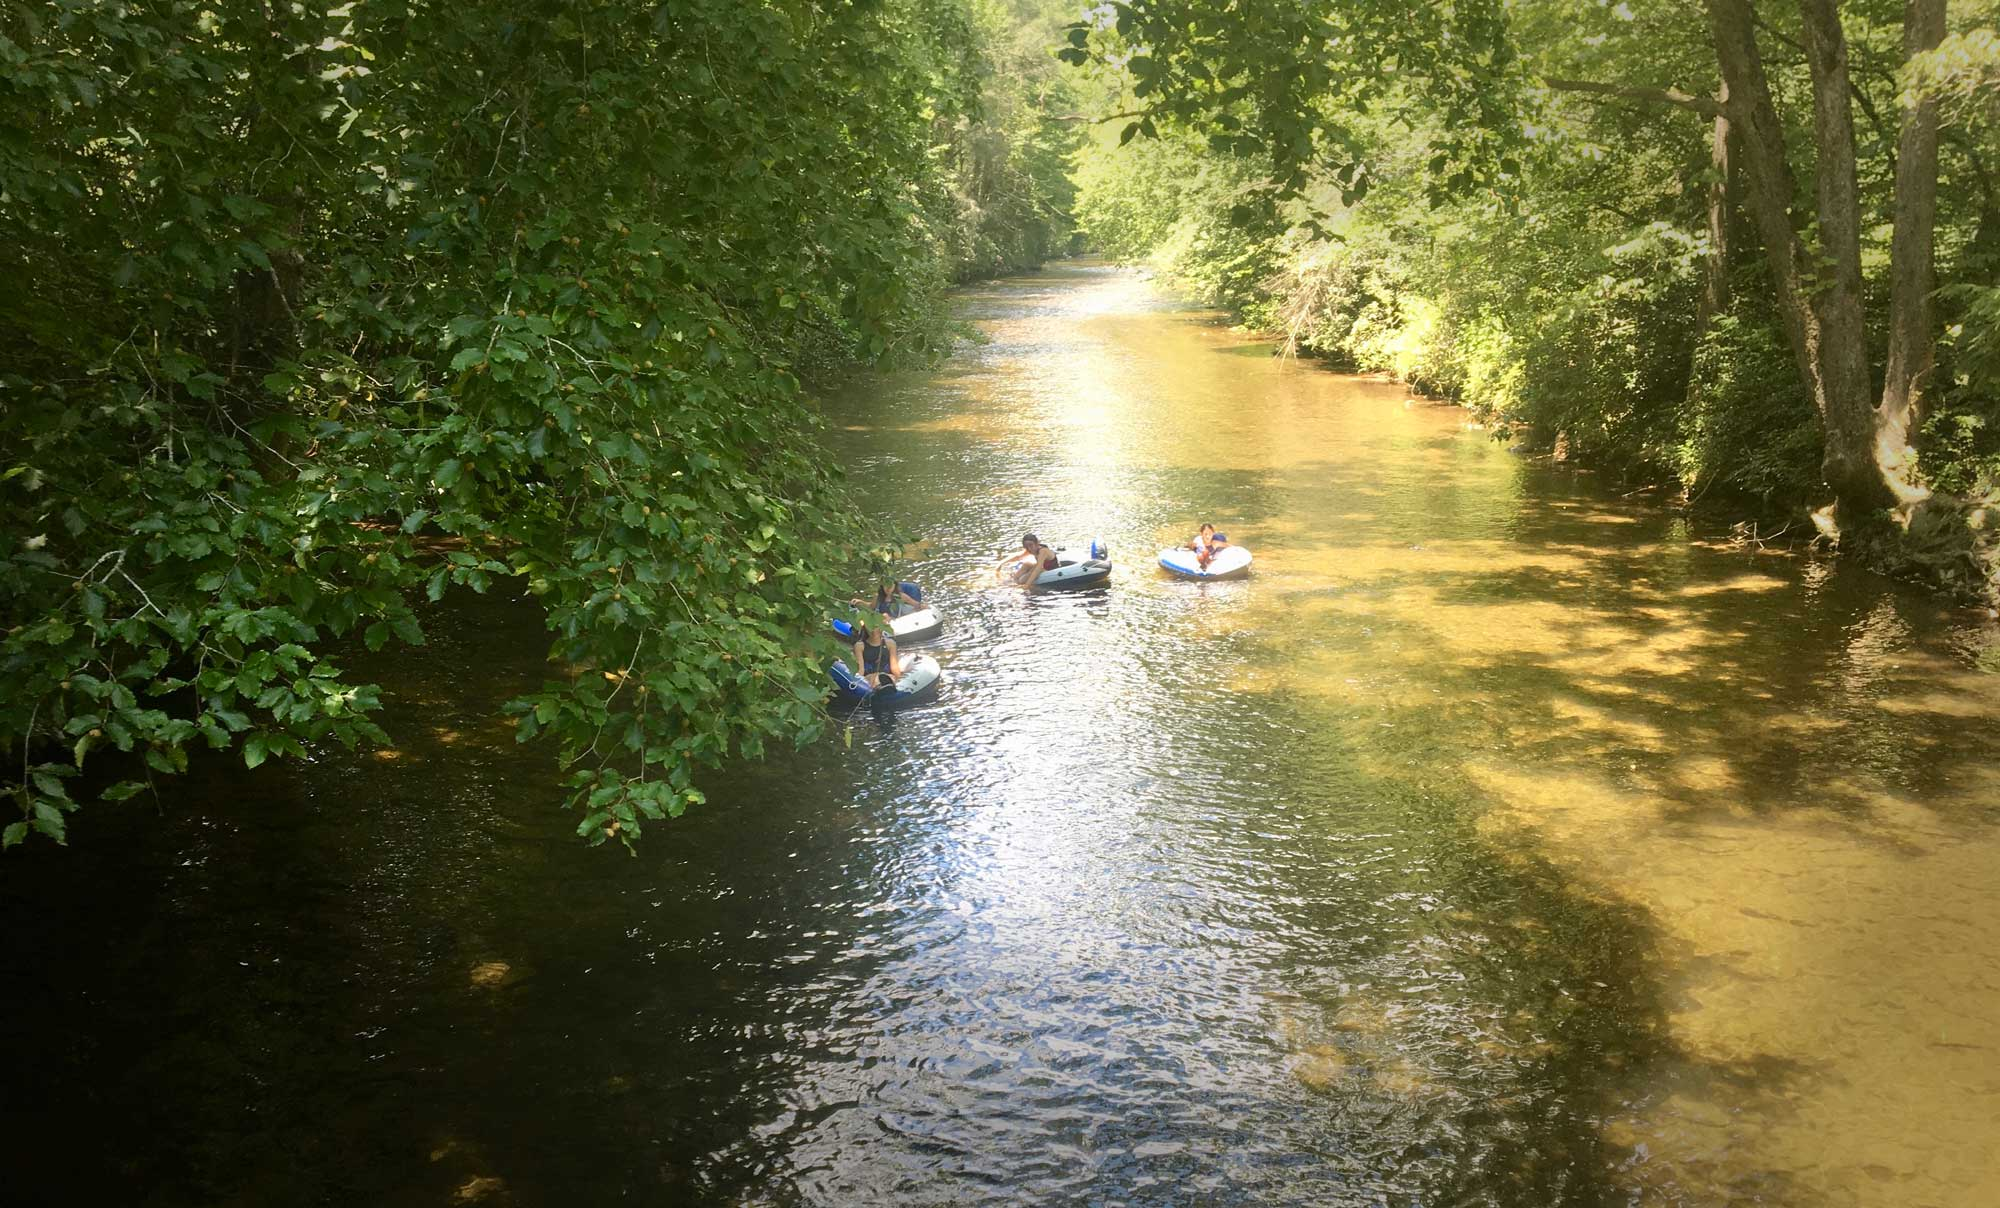 Four children tubing down Davidson River in Pisgah National Forest, near Davidson River Campground, North Carolina